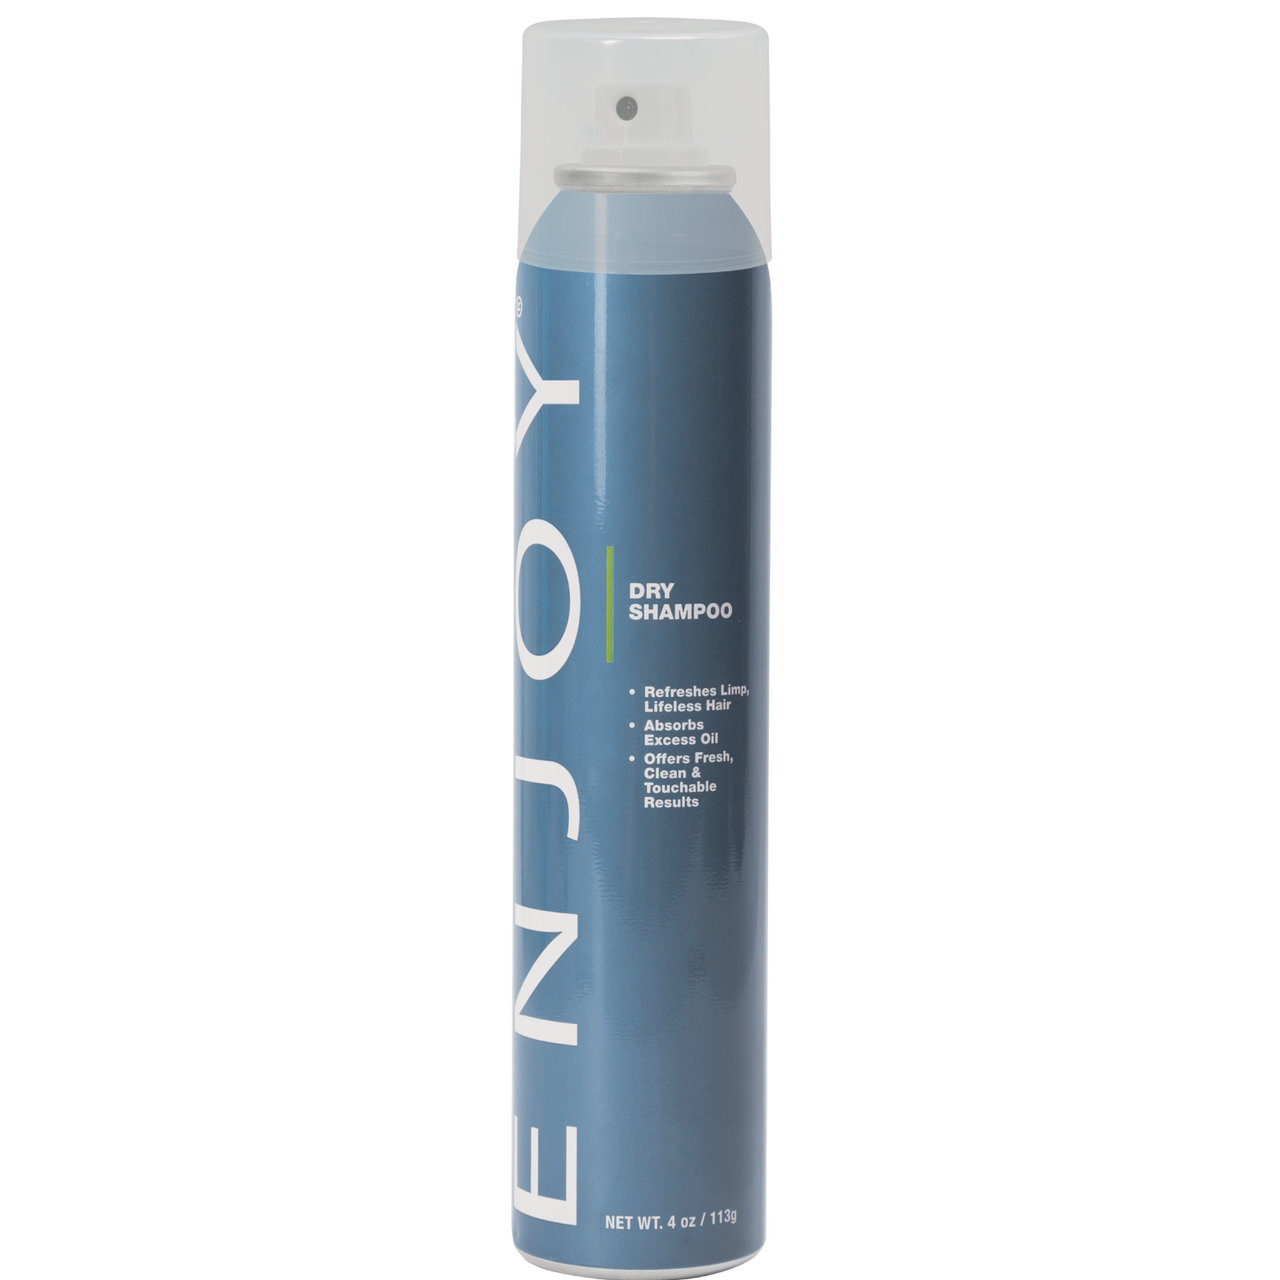 Enjoy Volumizing Dry Shampoo 4 oz